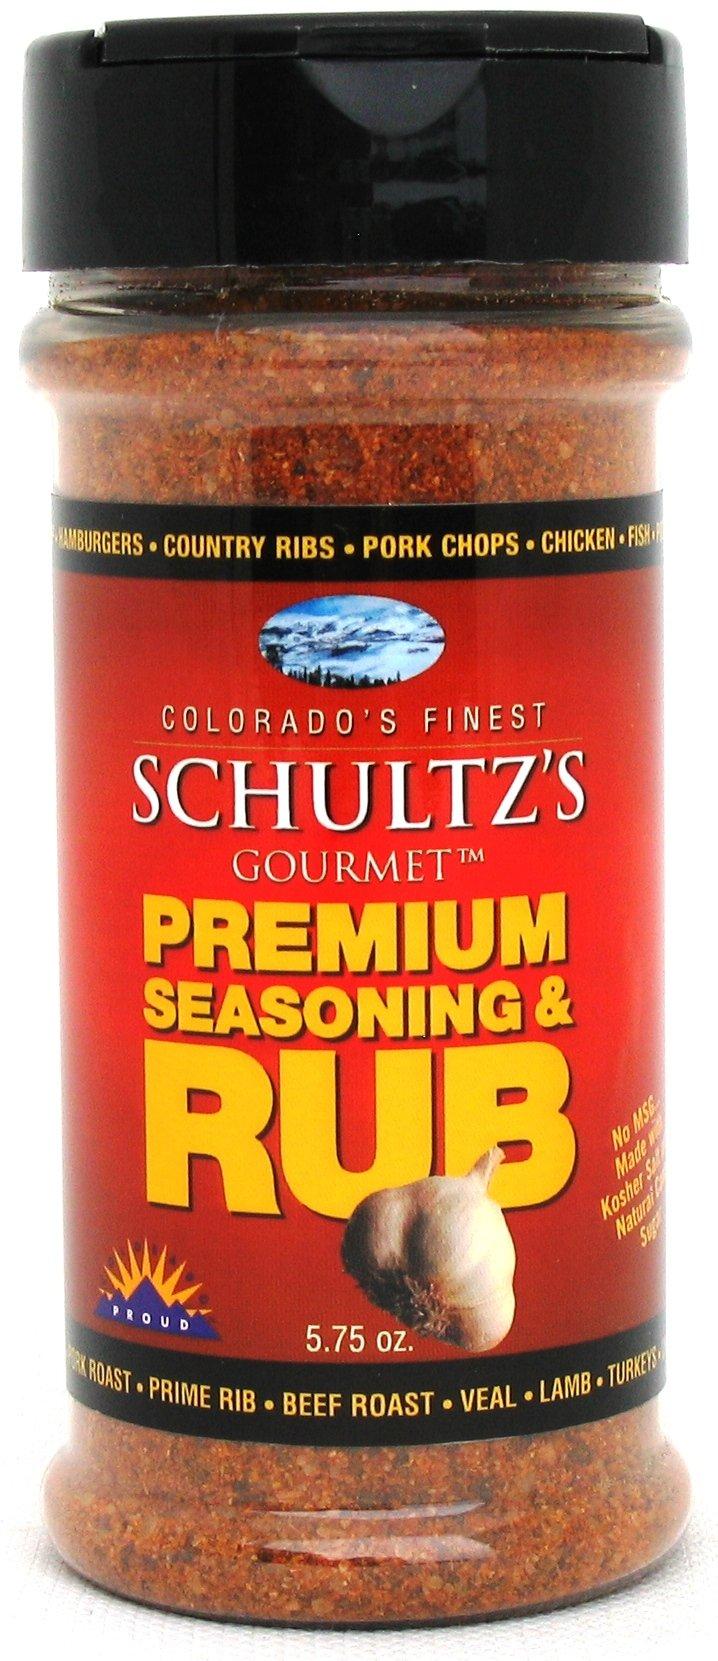 Schultz's Gourmet Premium Seasoning & Rub -- 5.75 oz